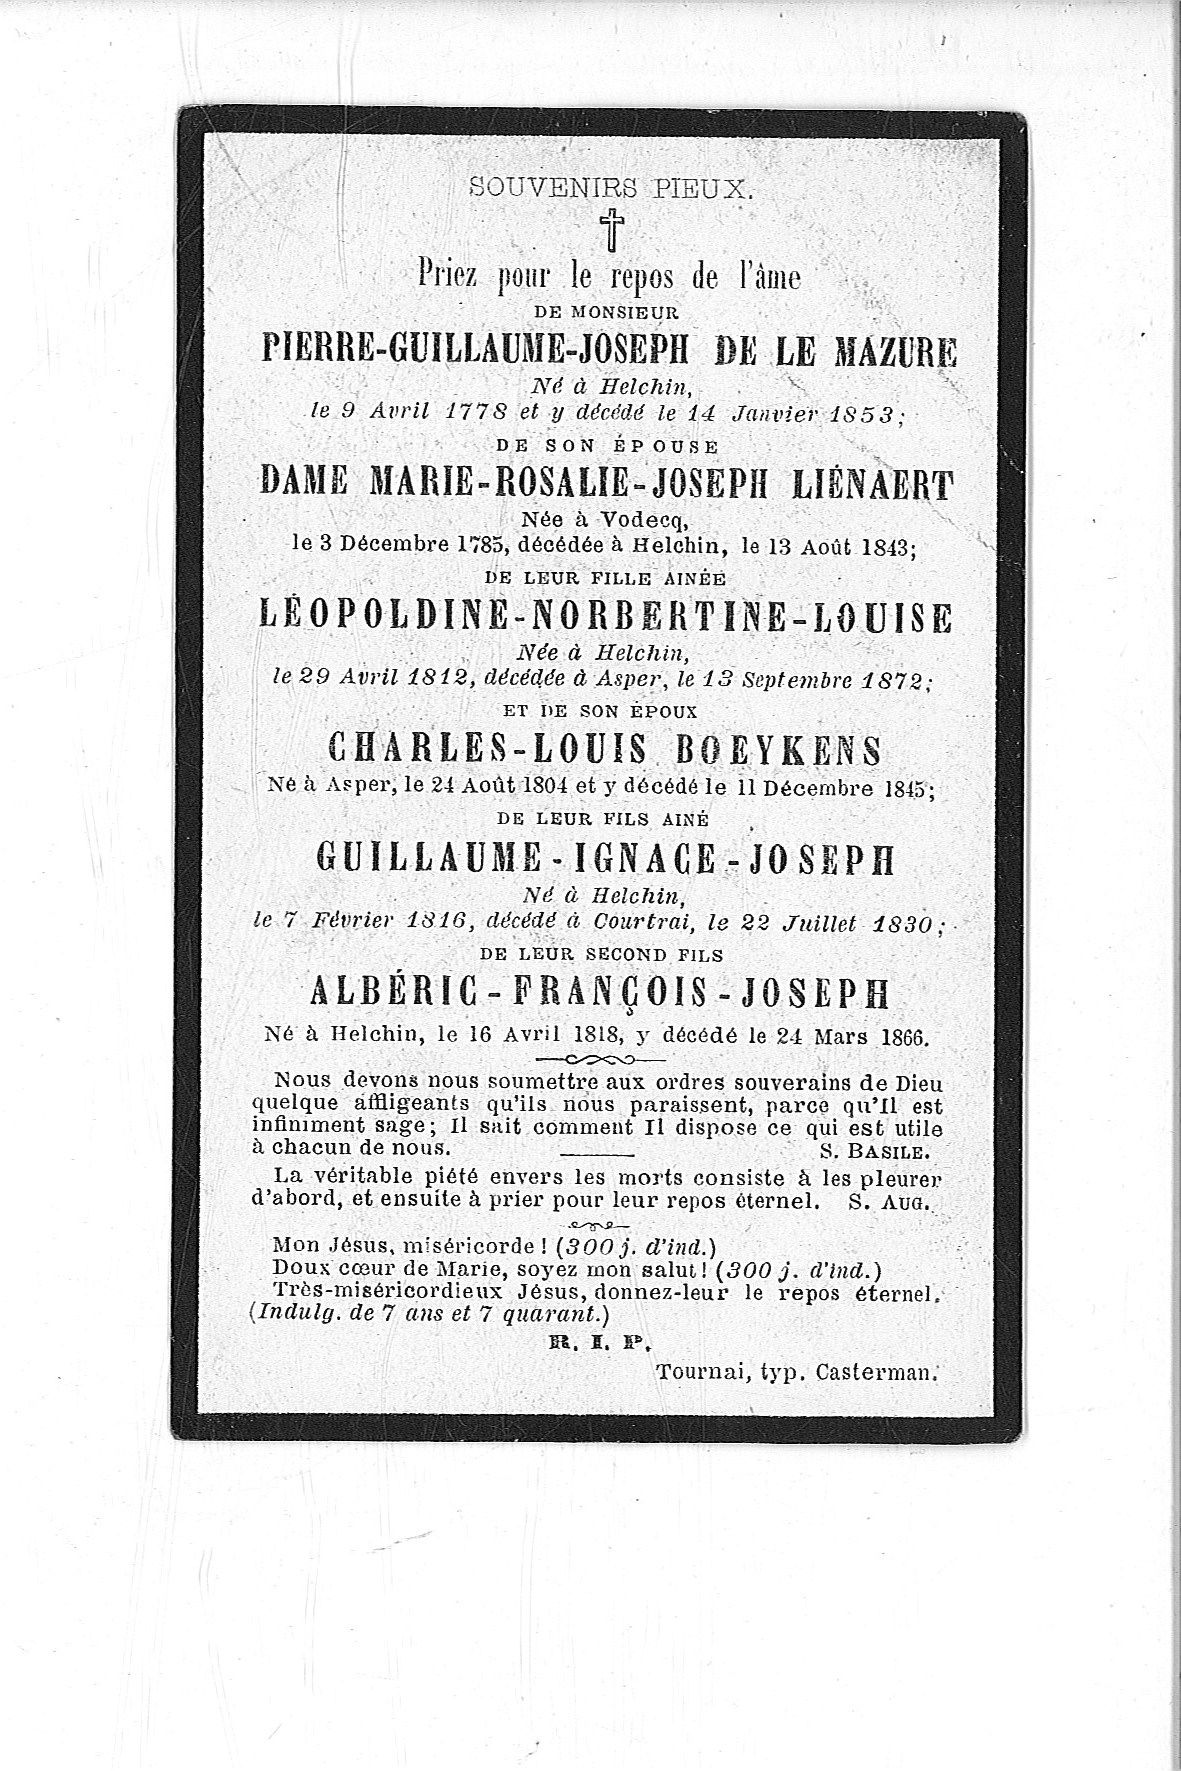 alberic-françois-joseph(1866)20090917083811_00004 - kopie.jpg